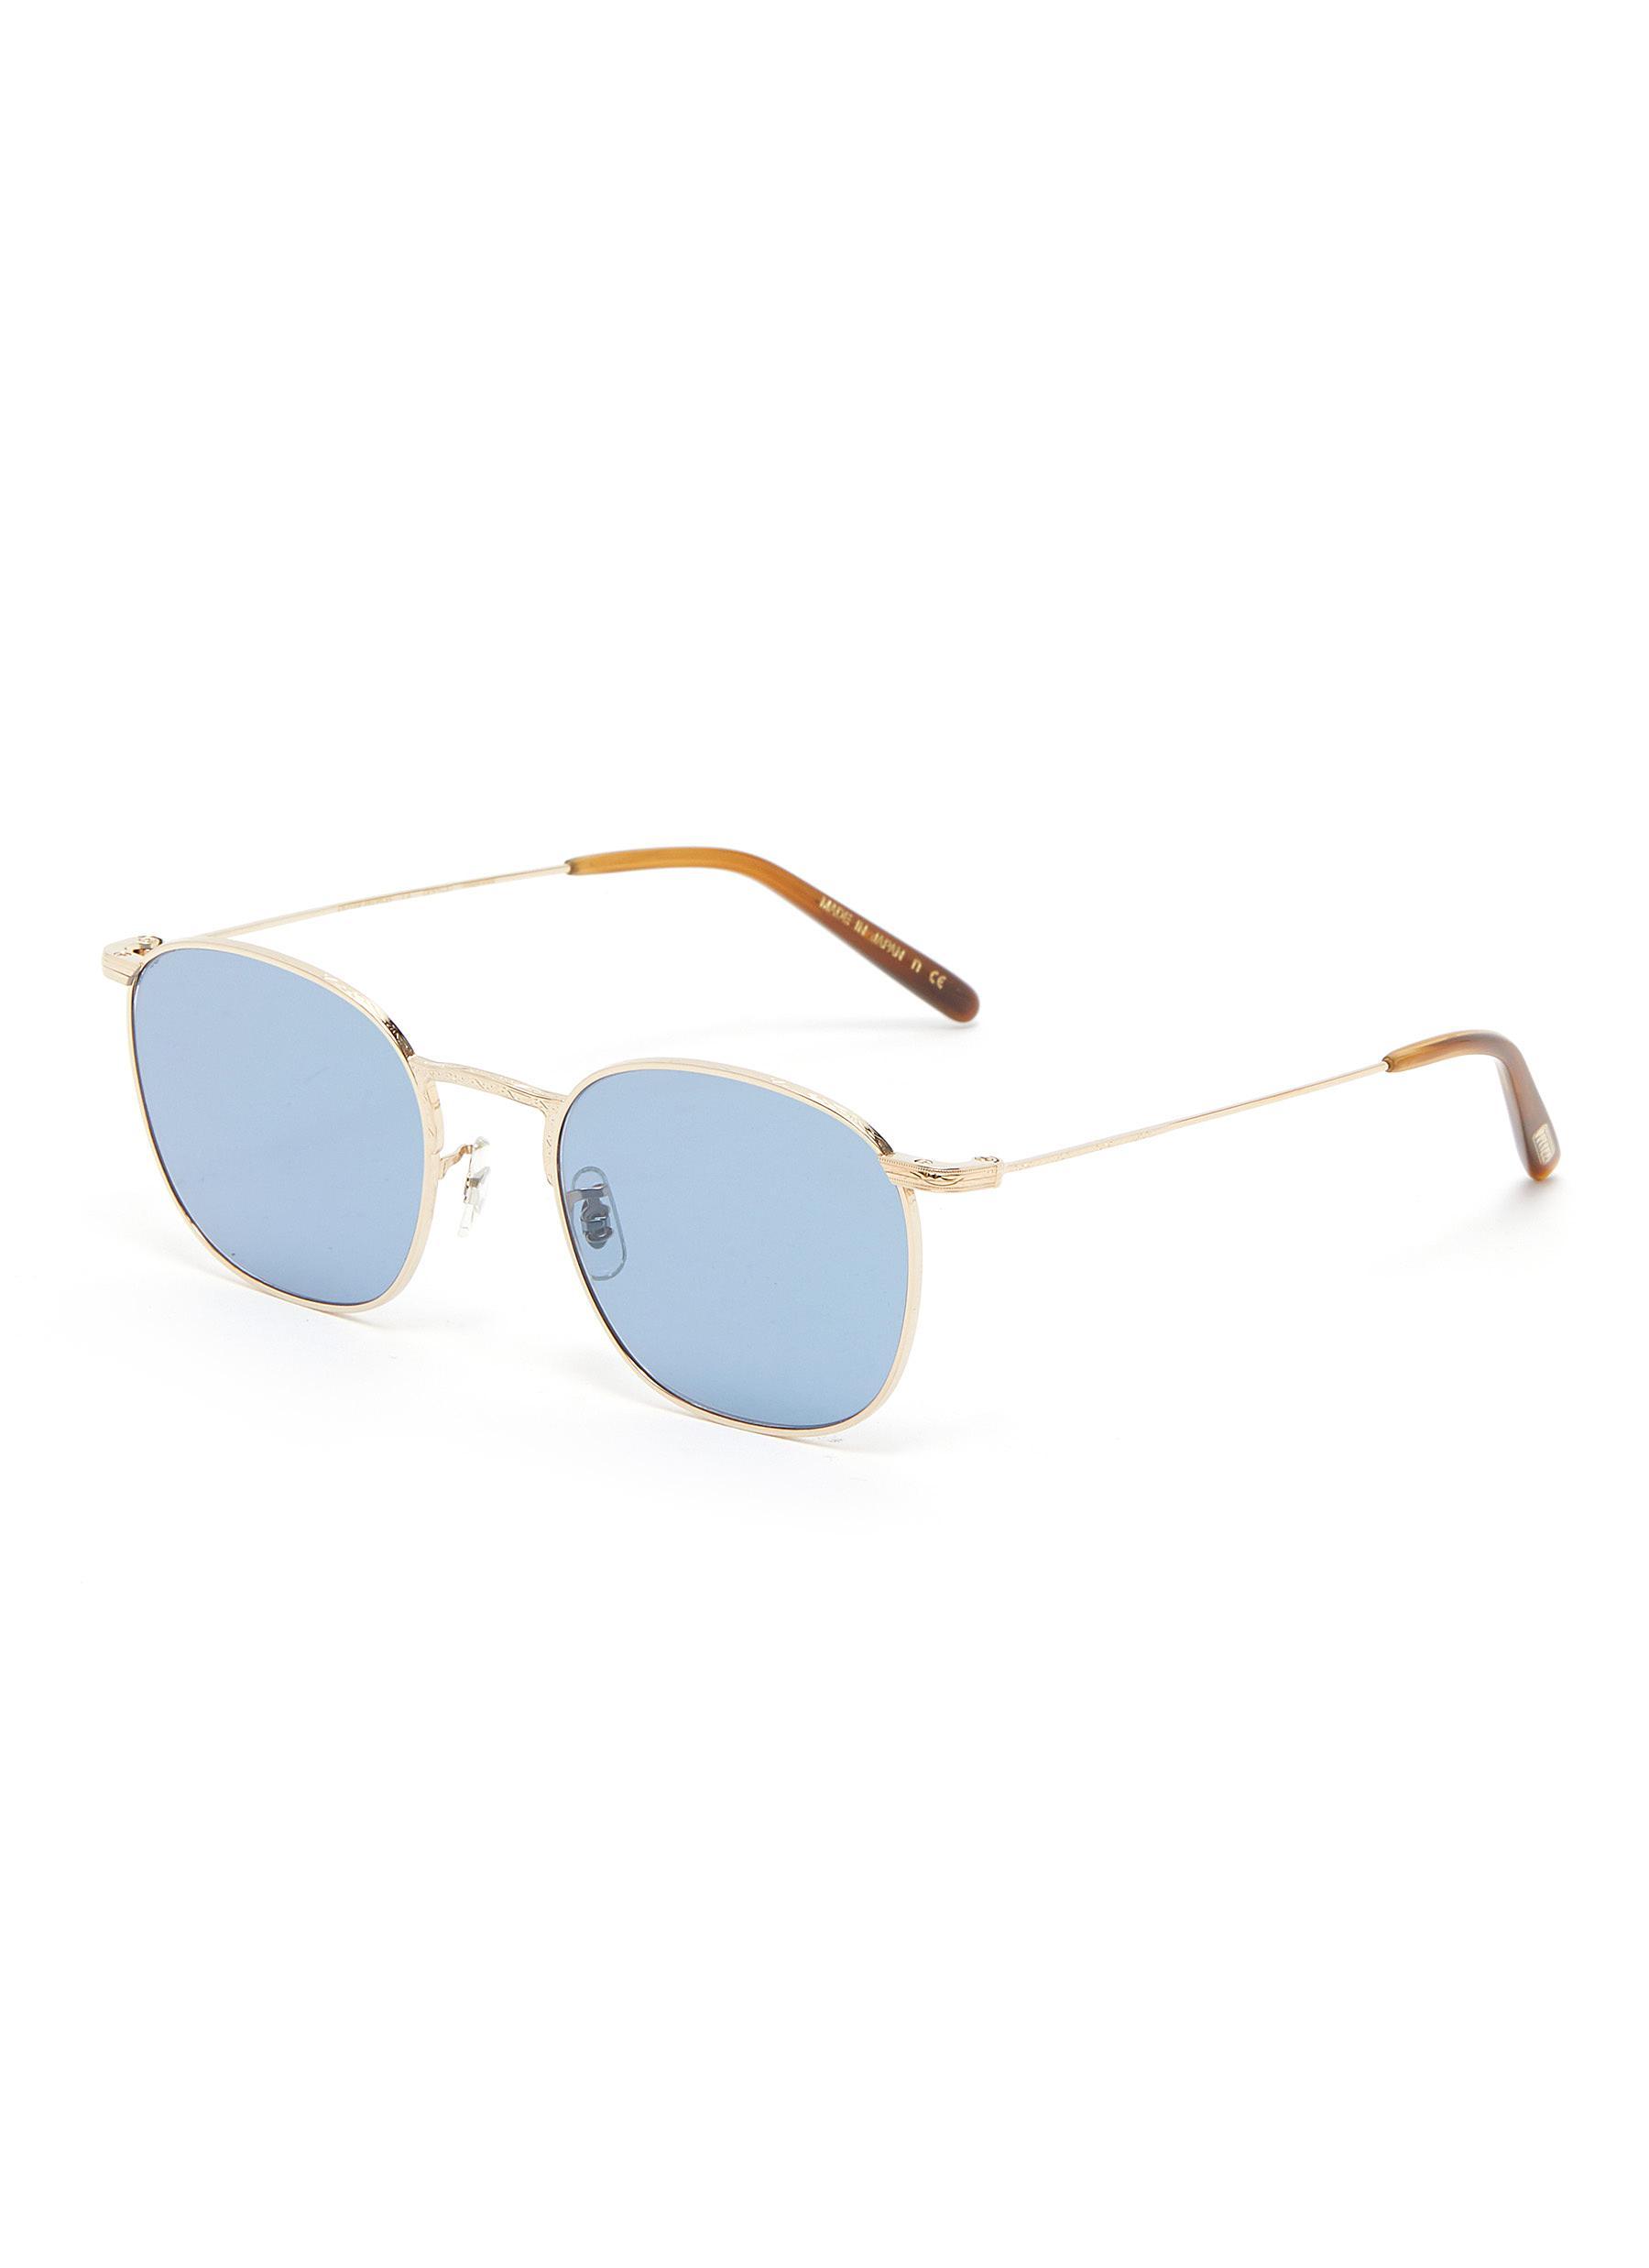 Goldsen Sun' Contrast Temple Carved Titanium Frame Sunglasses - OLIVER PEOPLES ACCESSORIES - Modalova